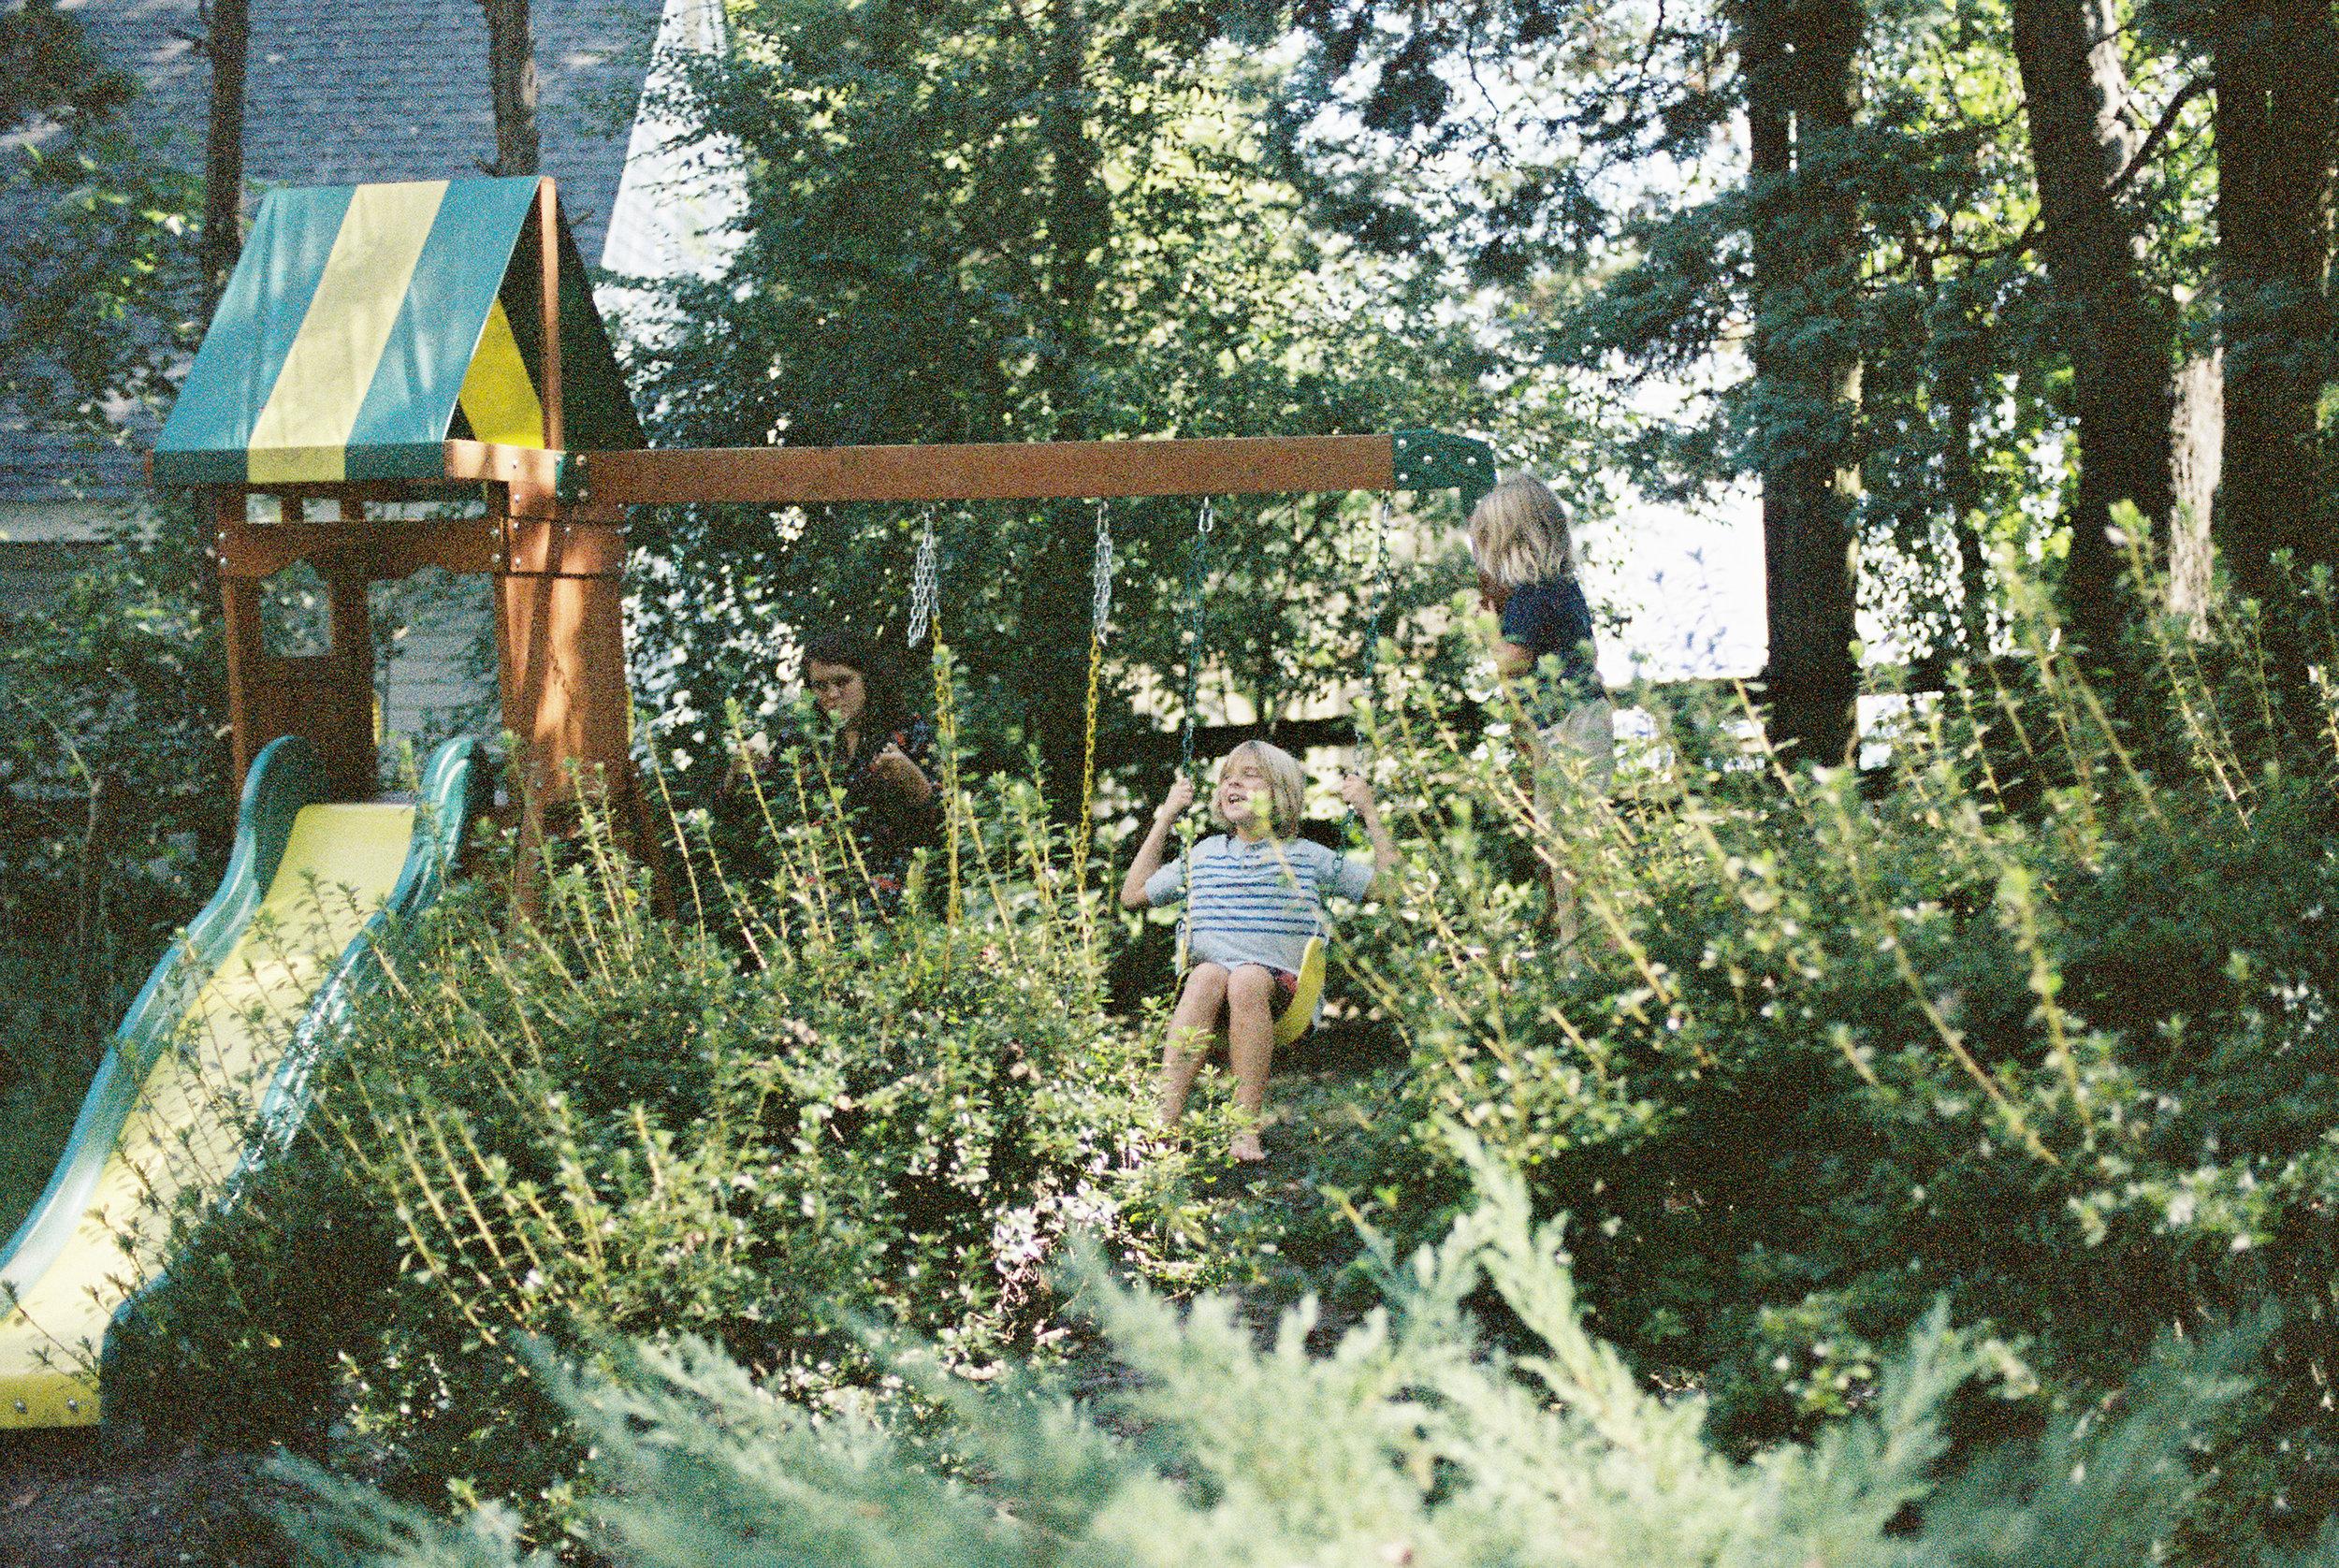 fall-2016 backyard playground behind the bush.jpg